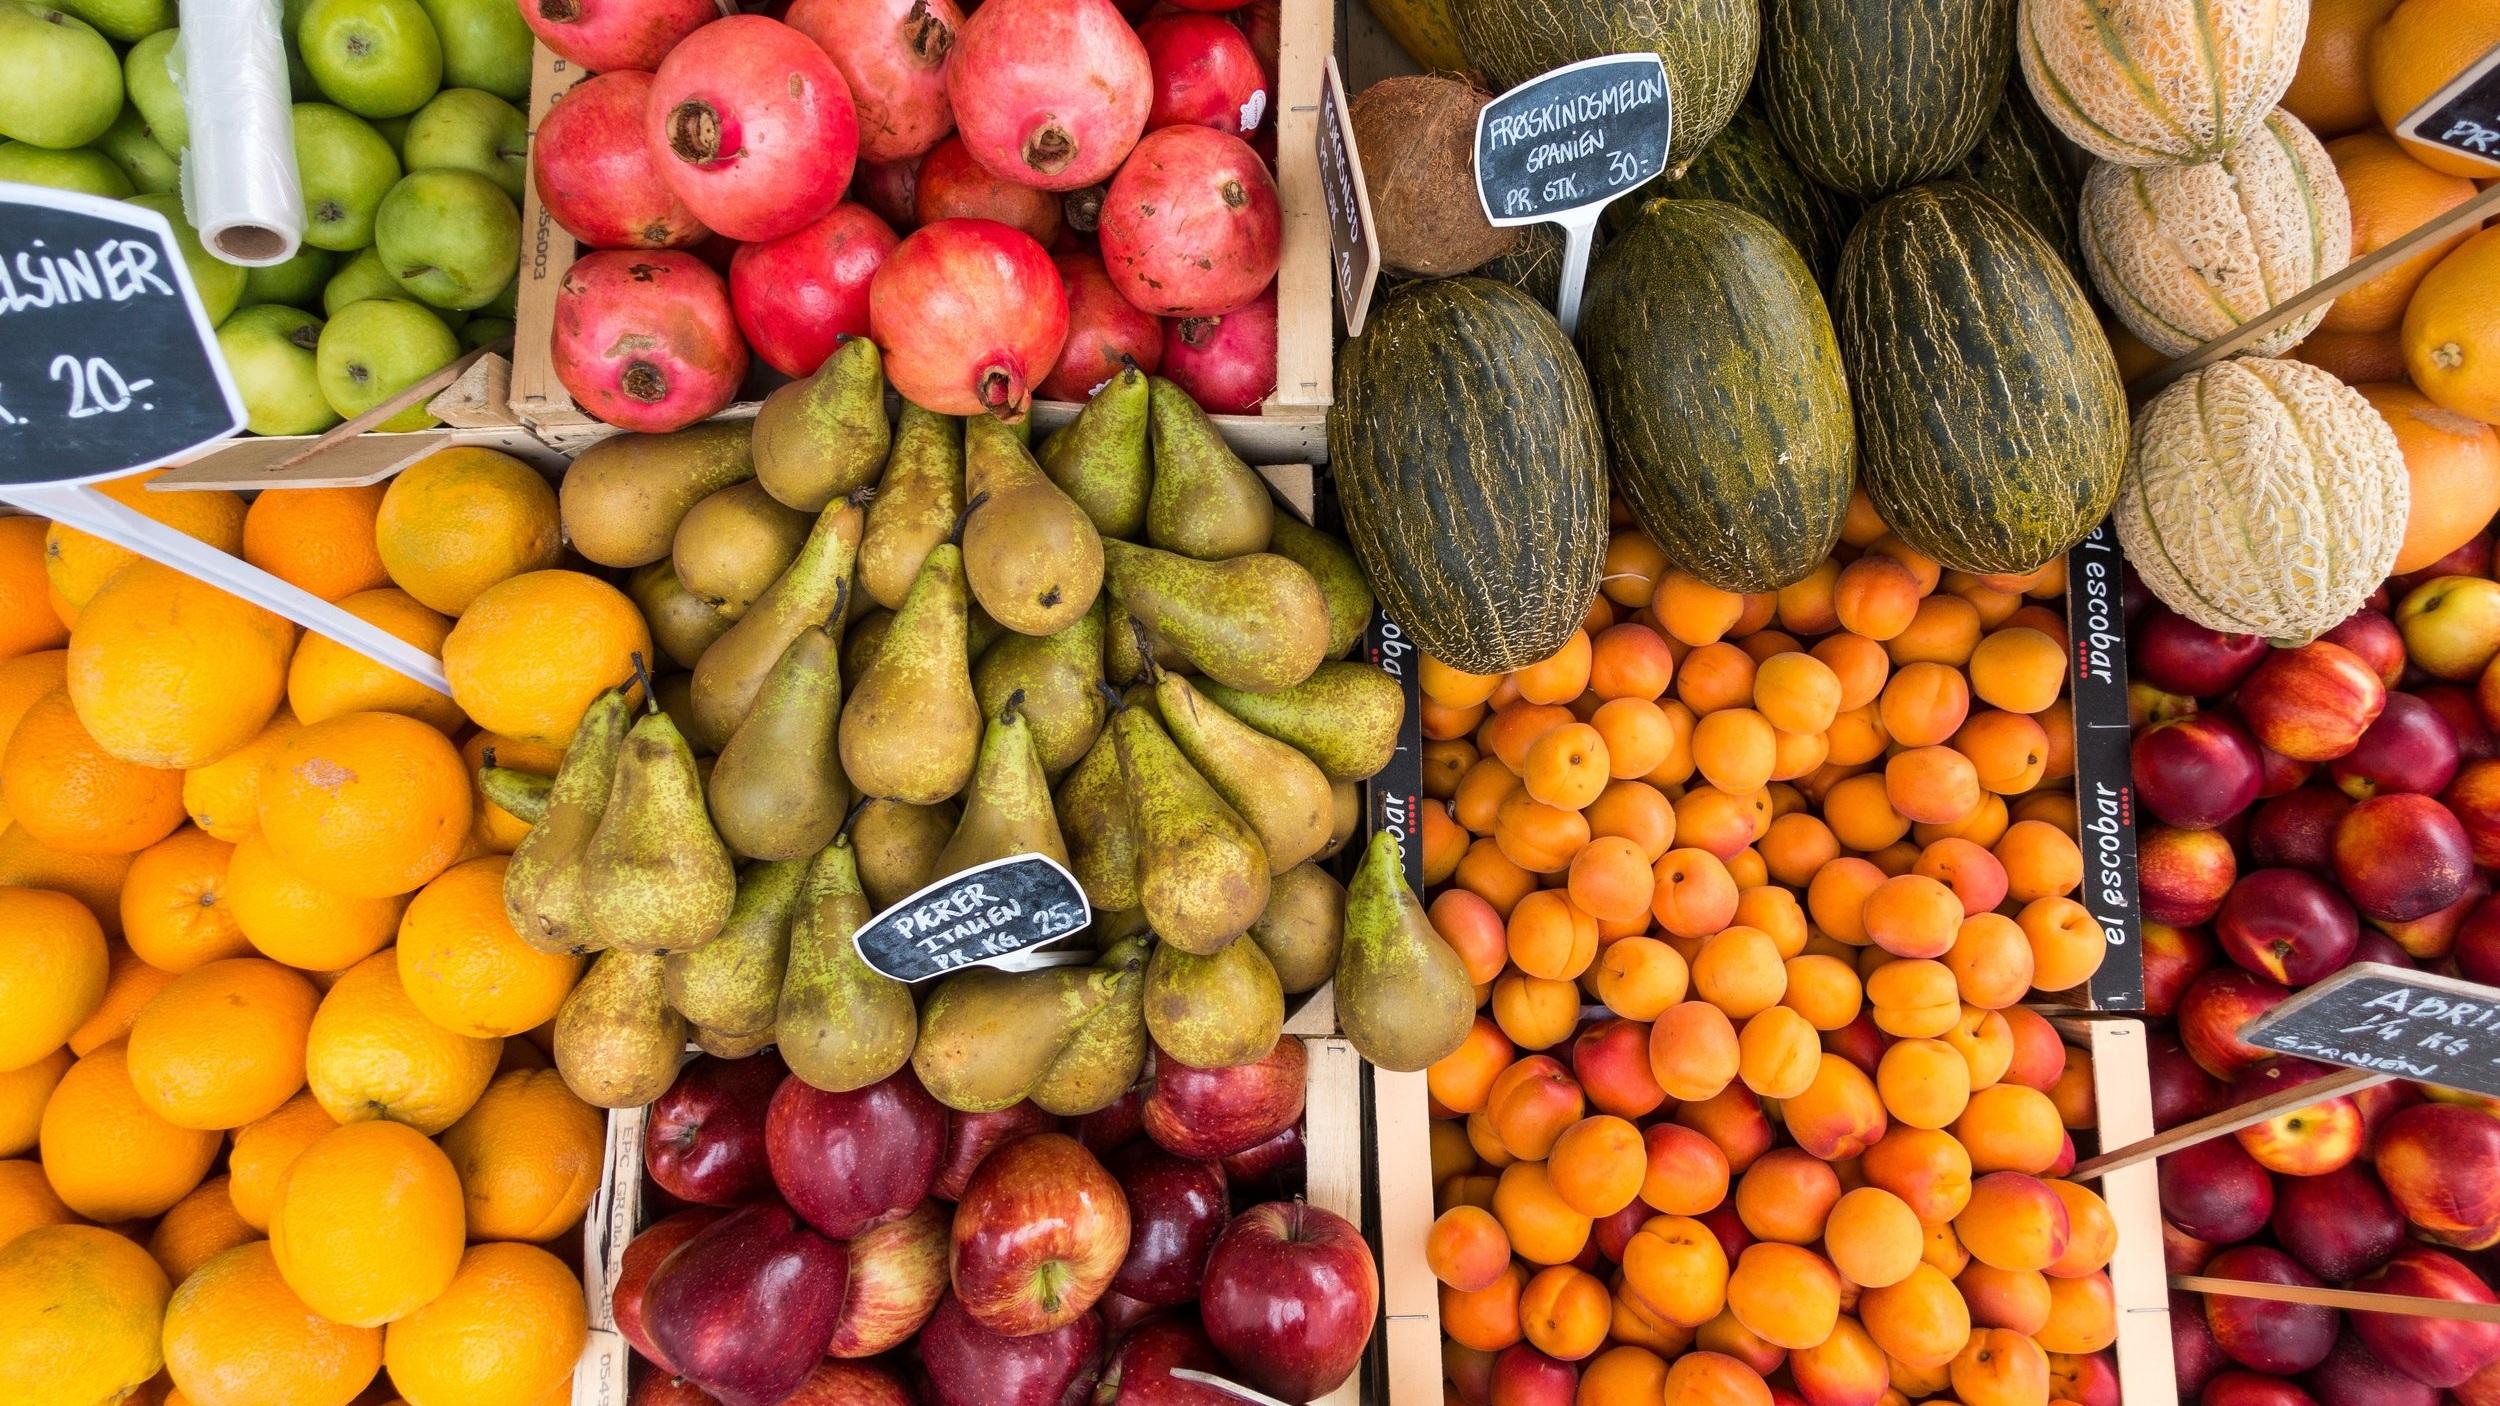 My body loves oranges…but apples make me gassy.